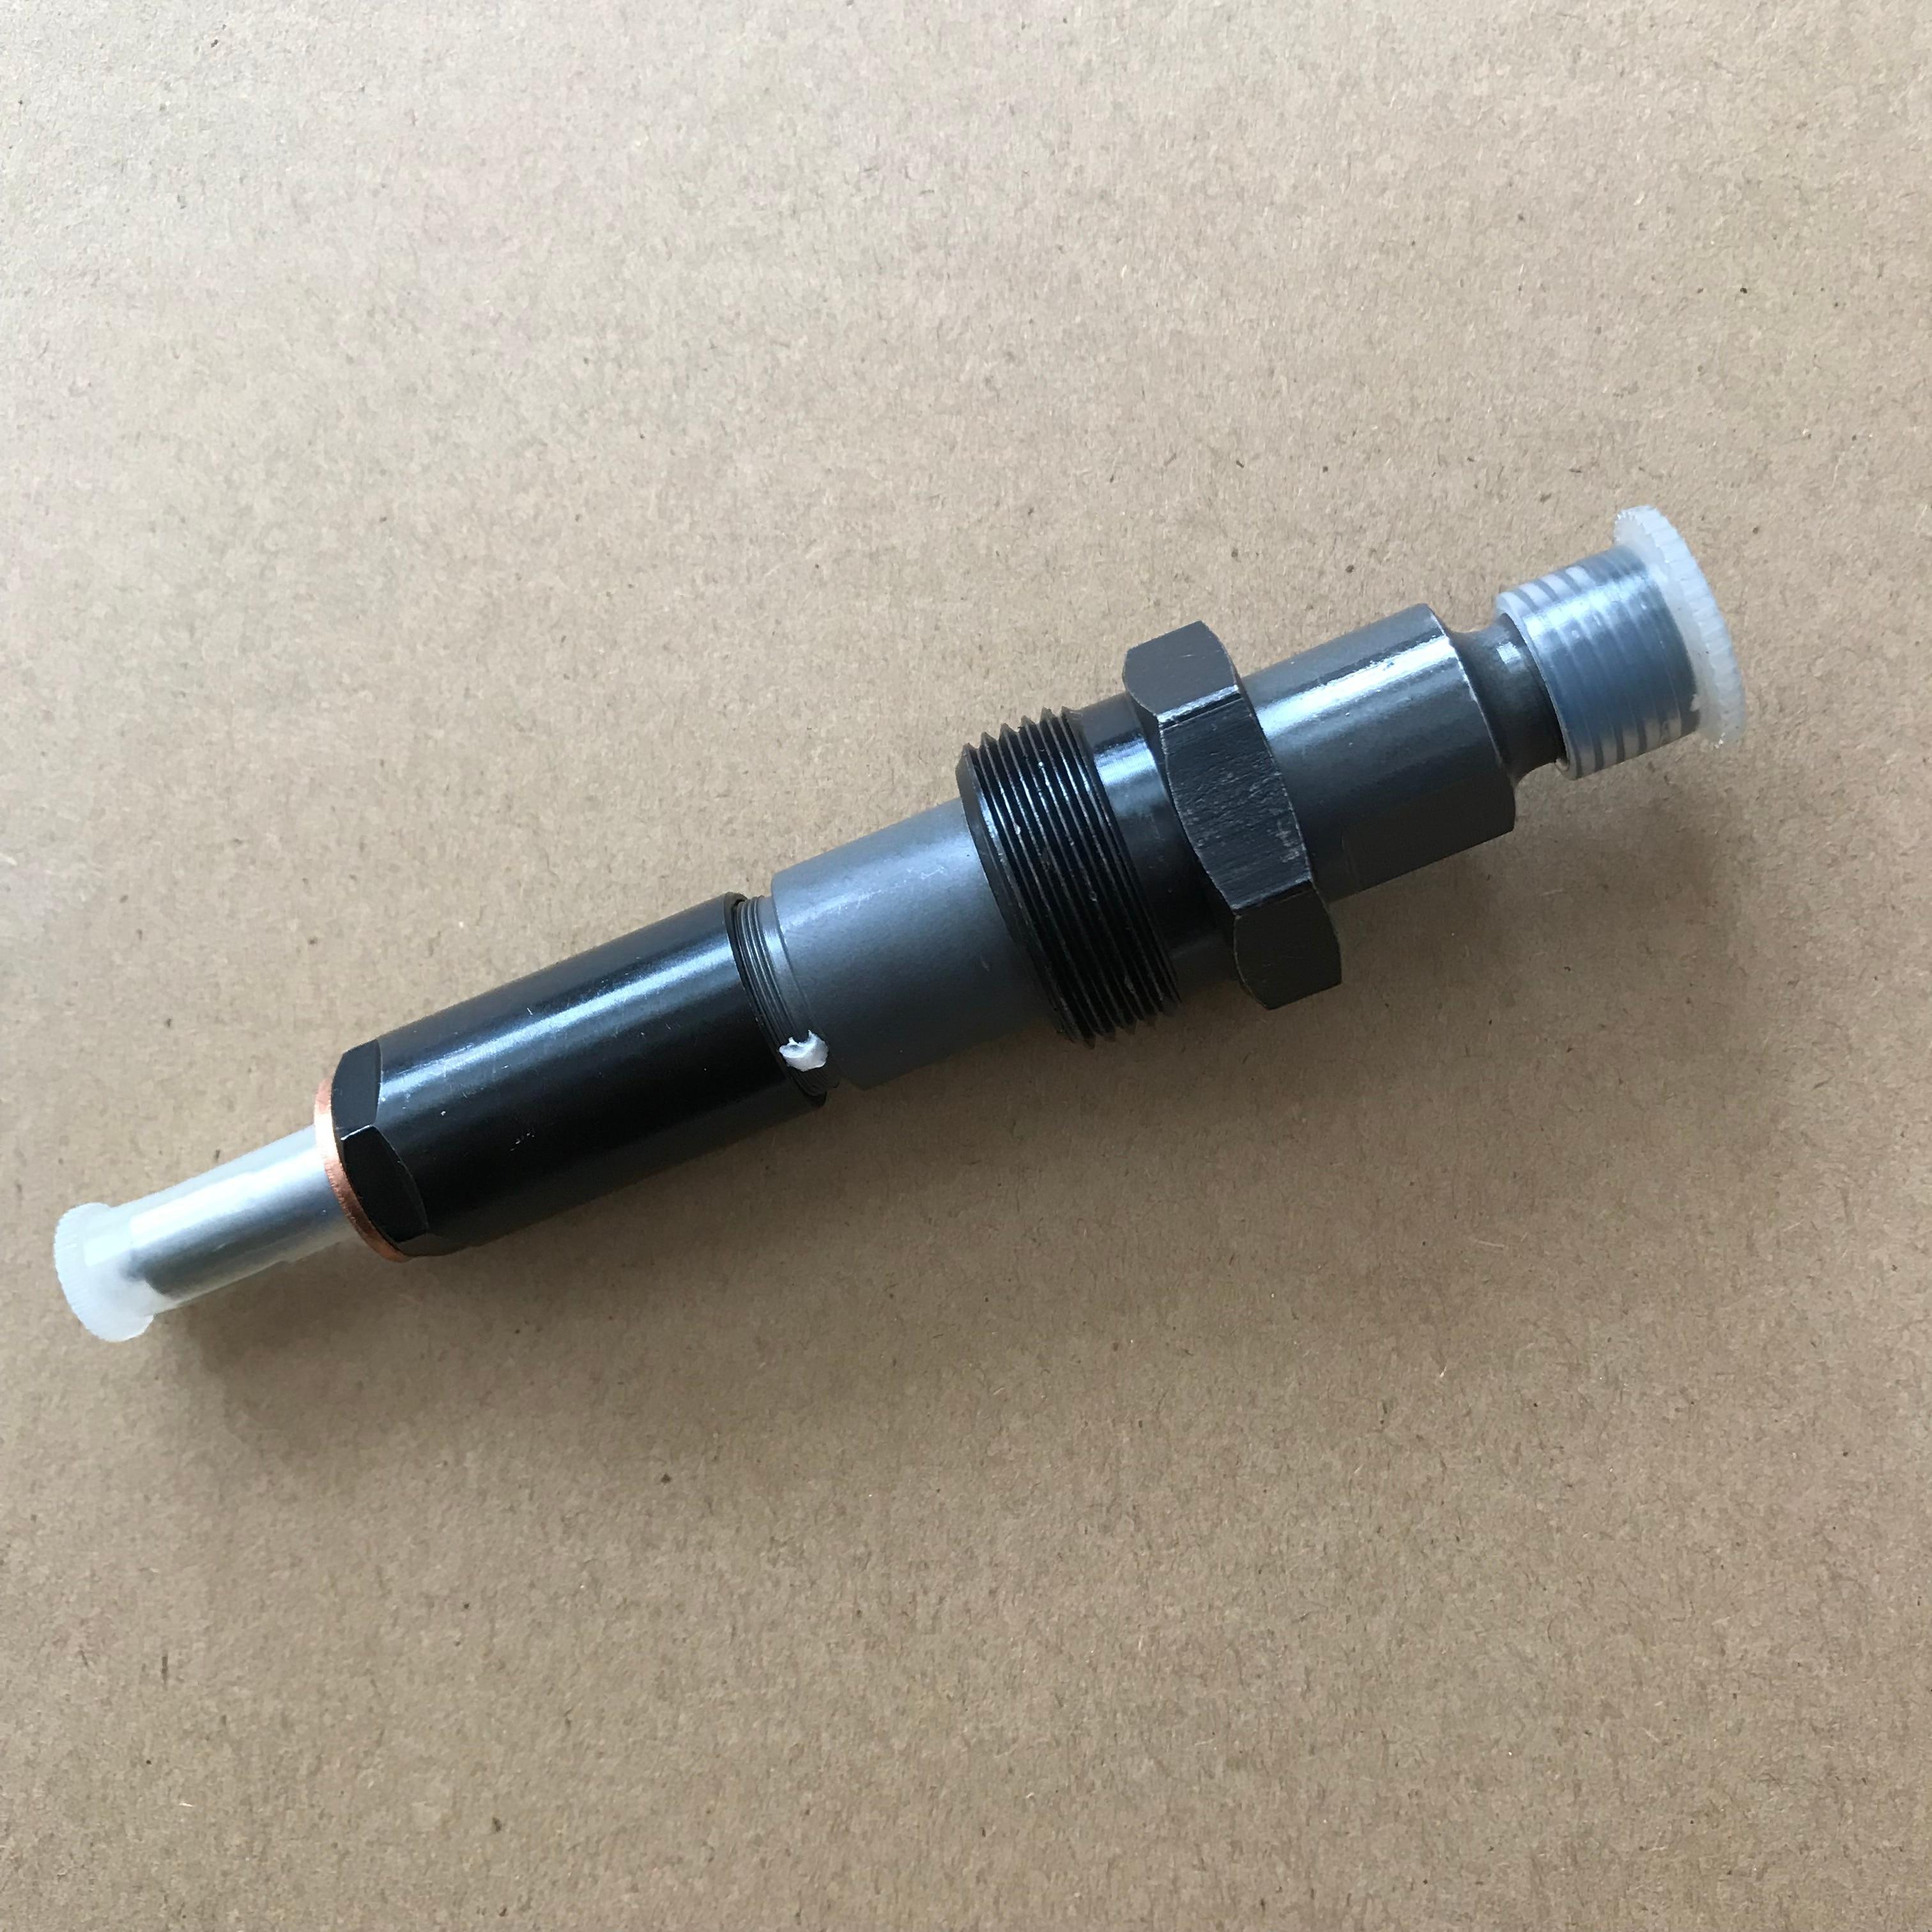 New Engine Fuel Injector 3932123 for Cummins 4BT 3.9 Truck